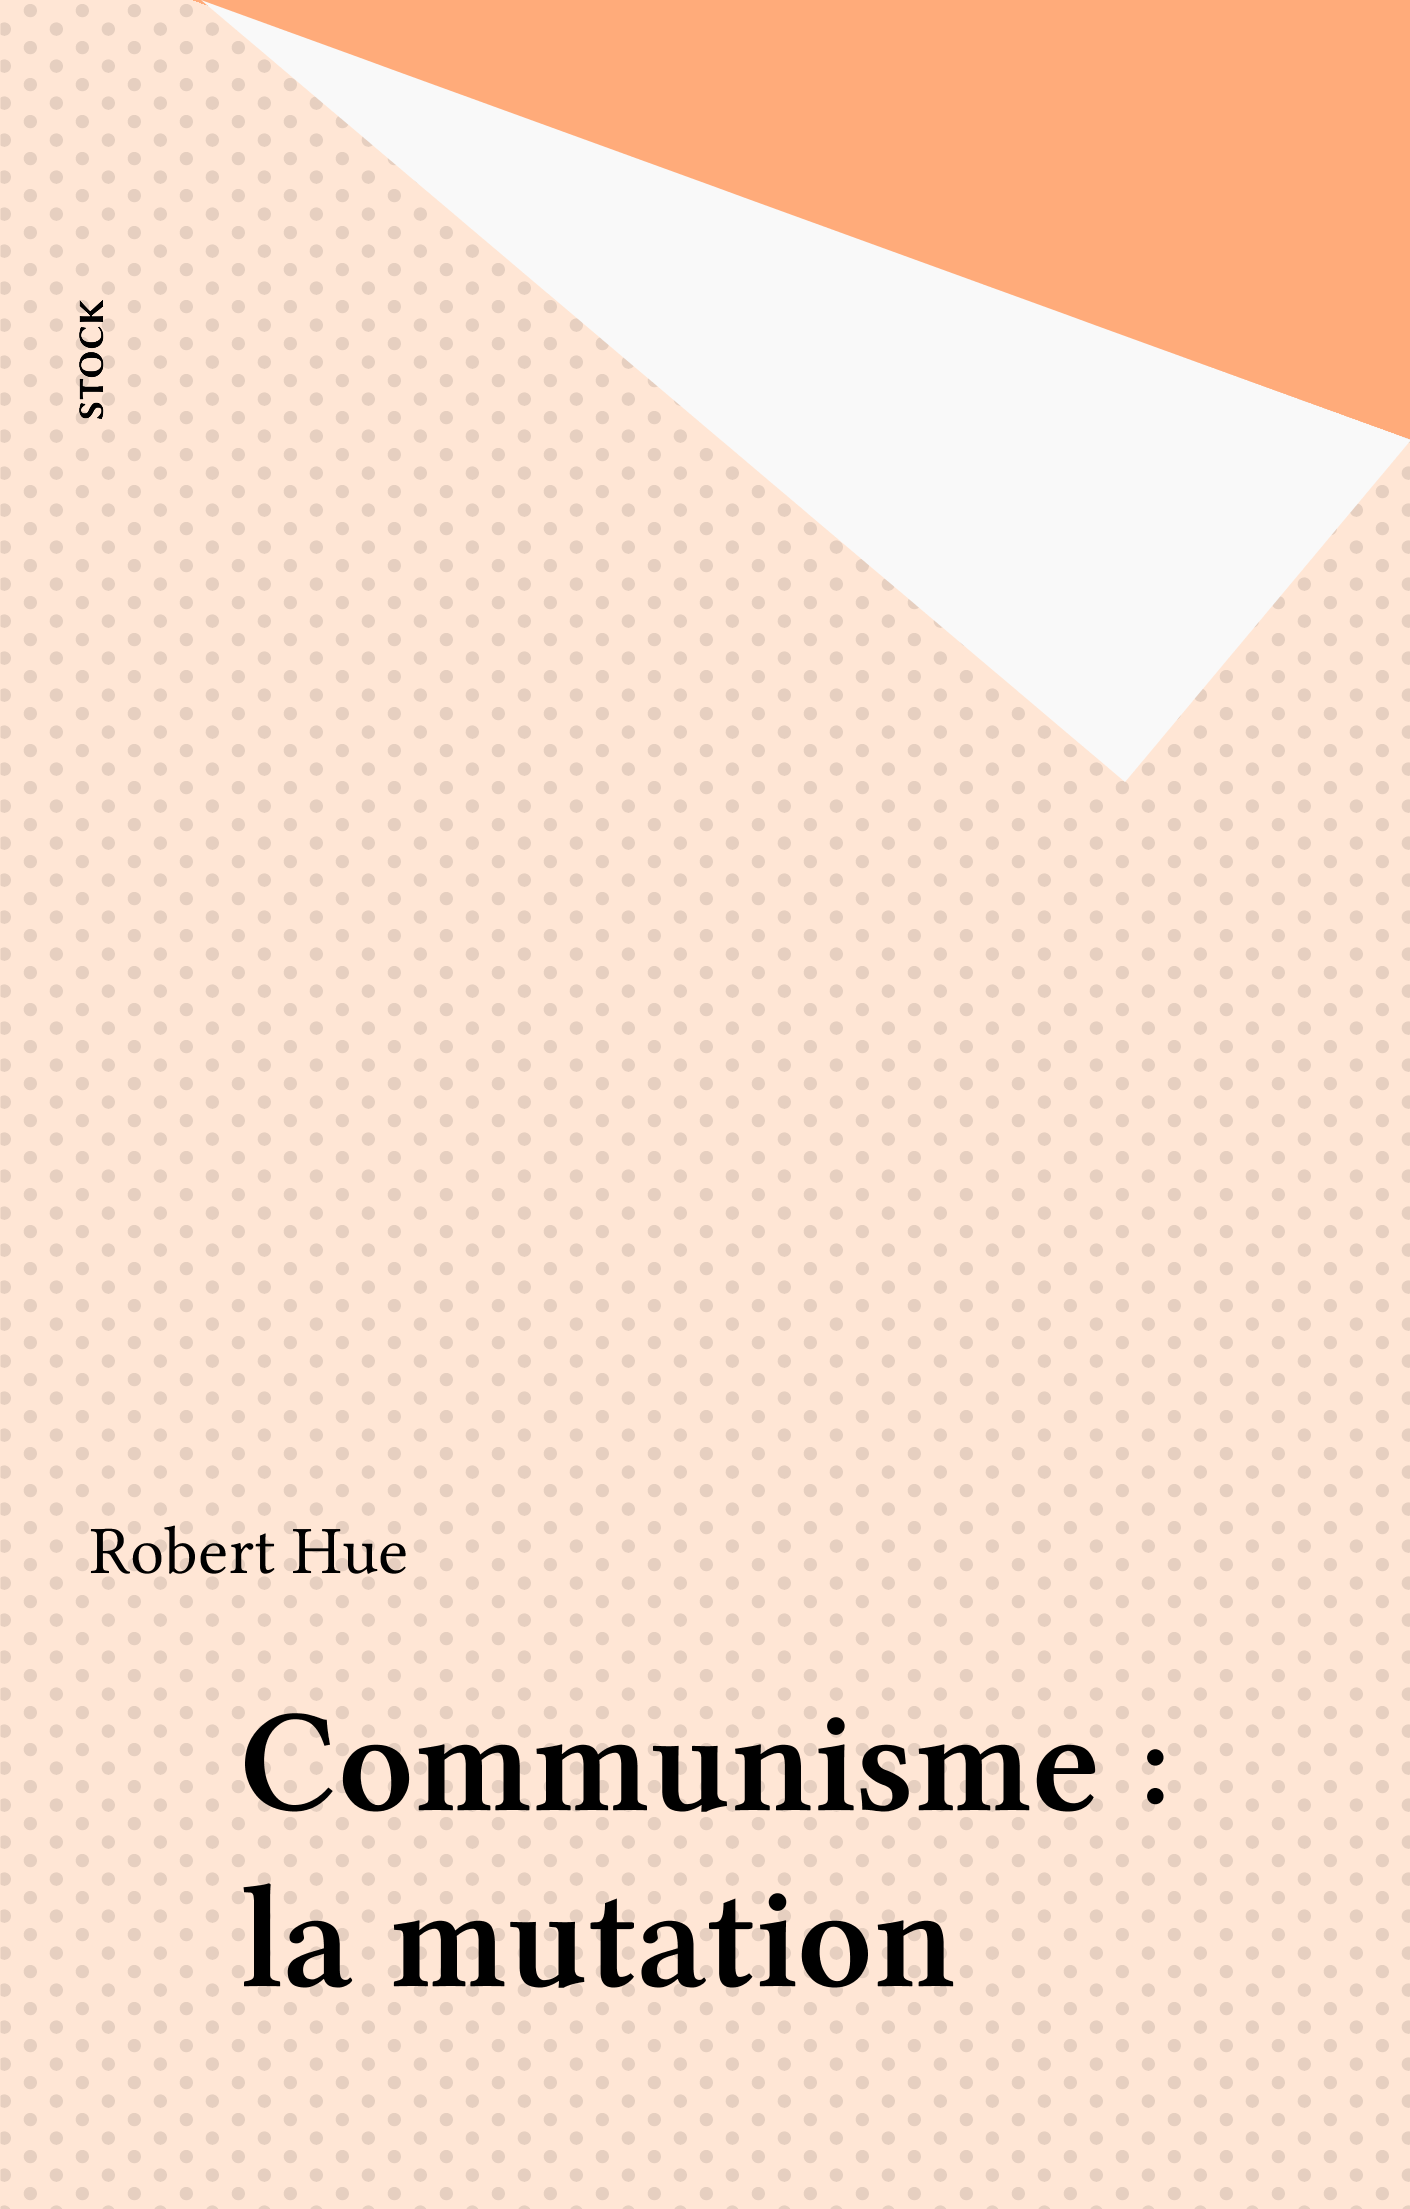 Communisme : la mutation